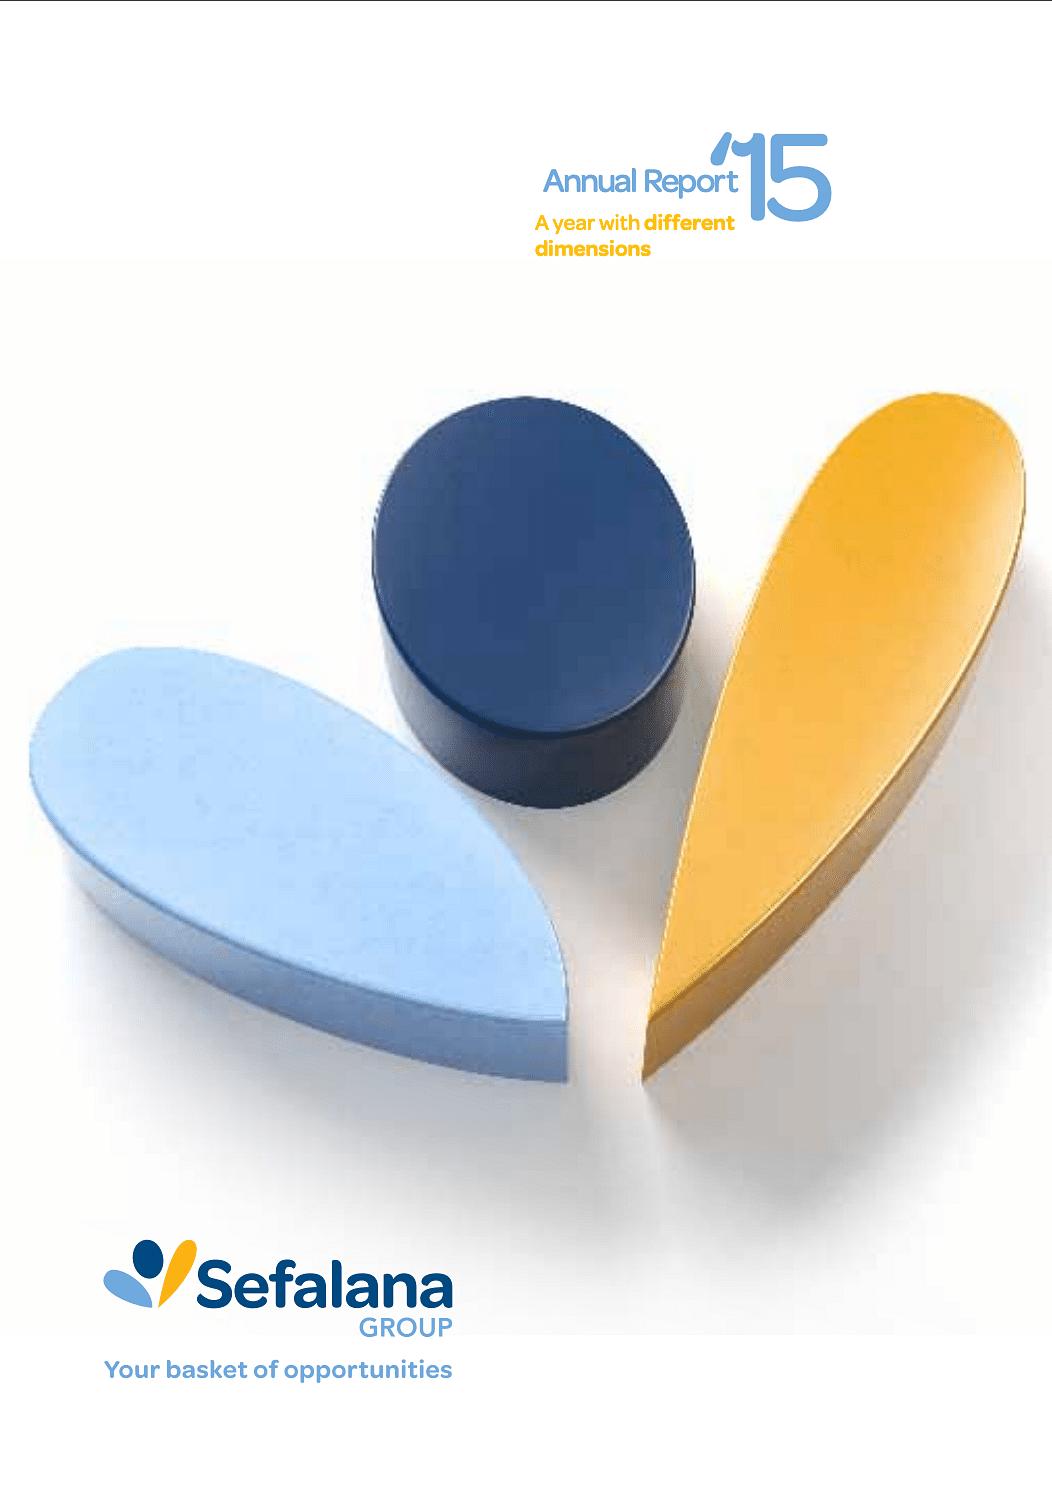 Sefalana Annual Report 2015 cover